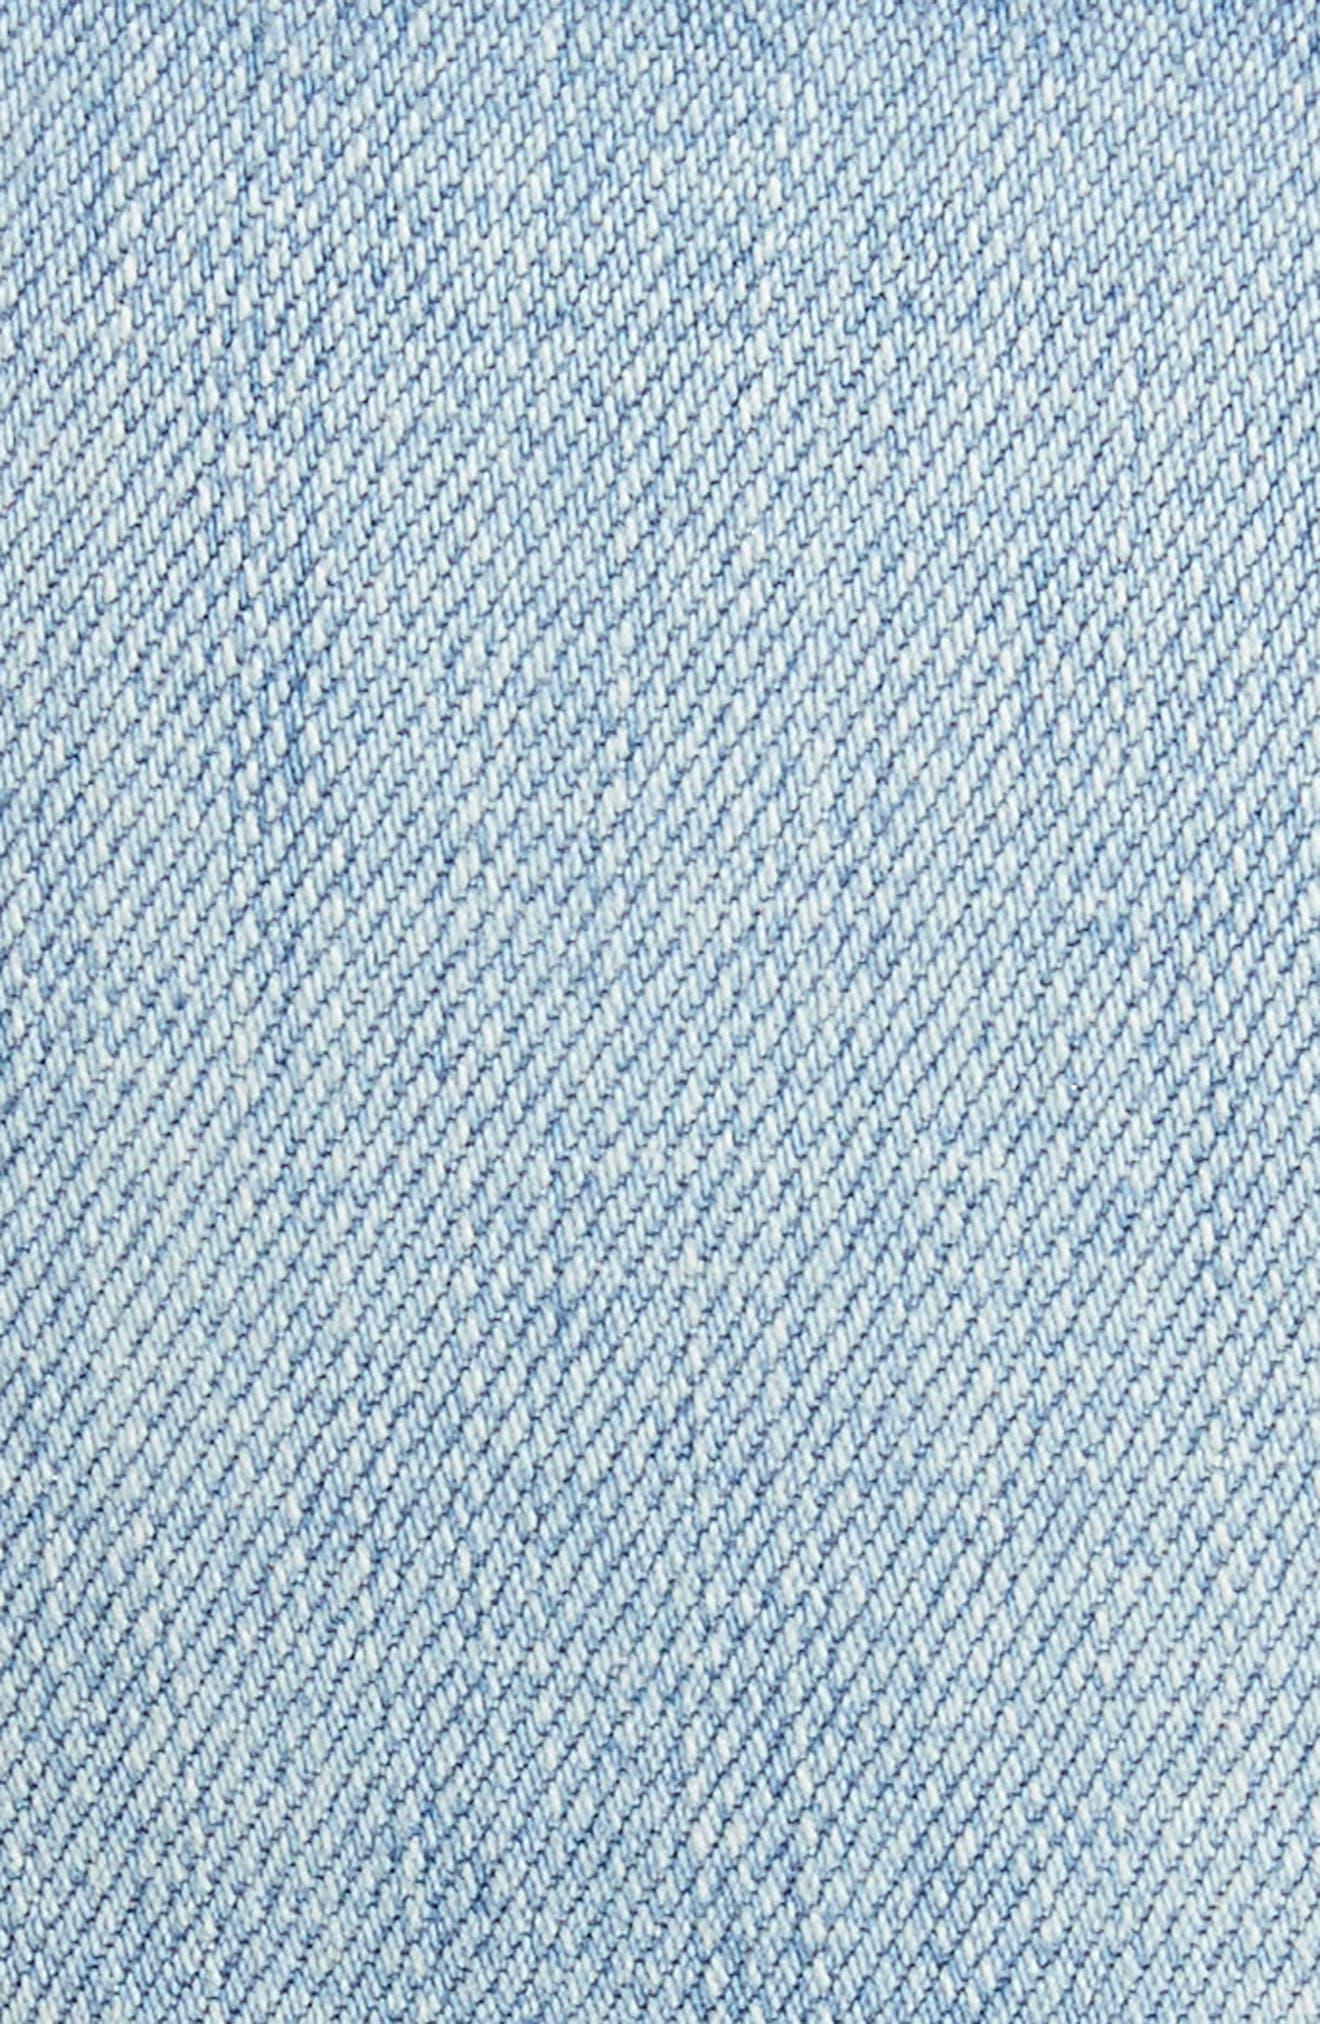 Marcelle Foil Crop Skinny Jeans,                             Alternate thumbnail 5, color,                             451